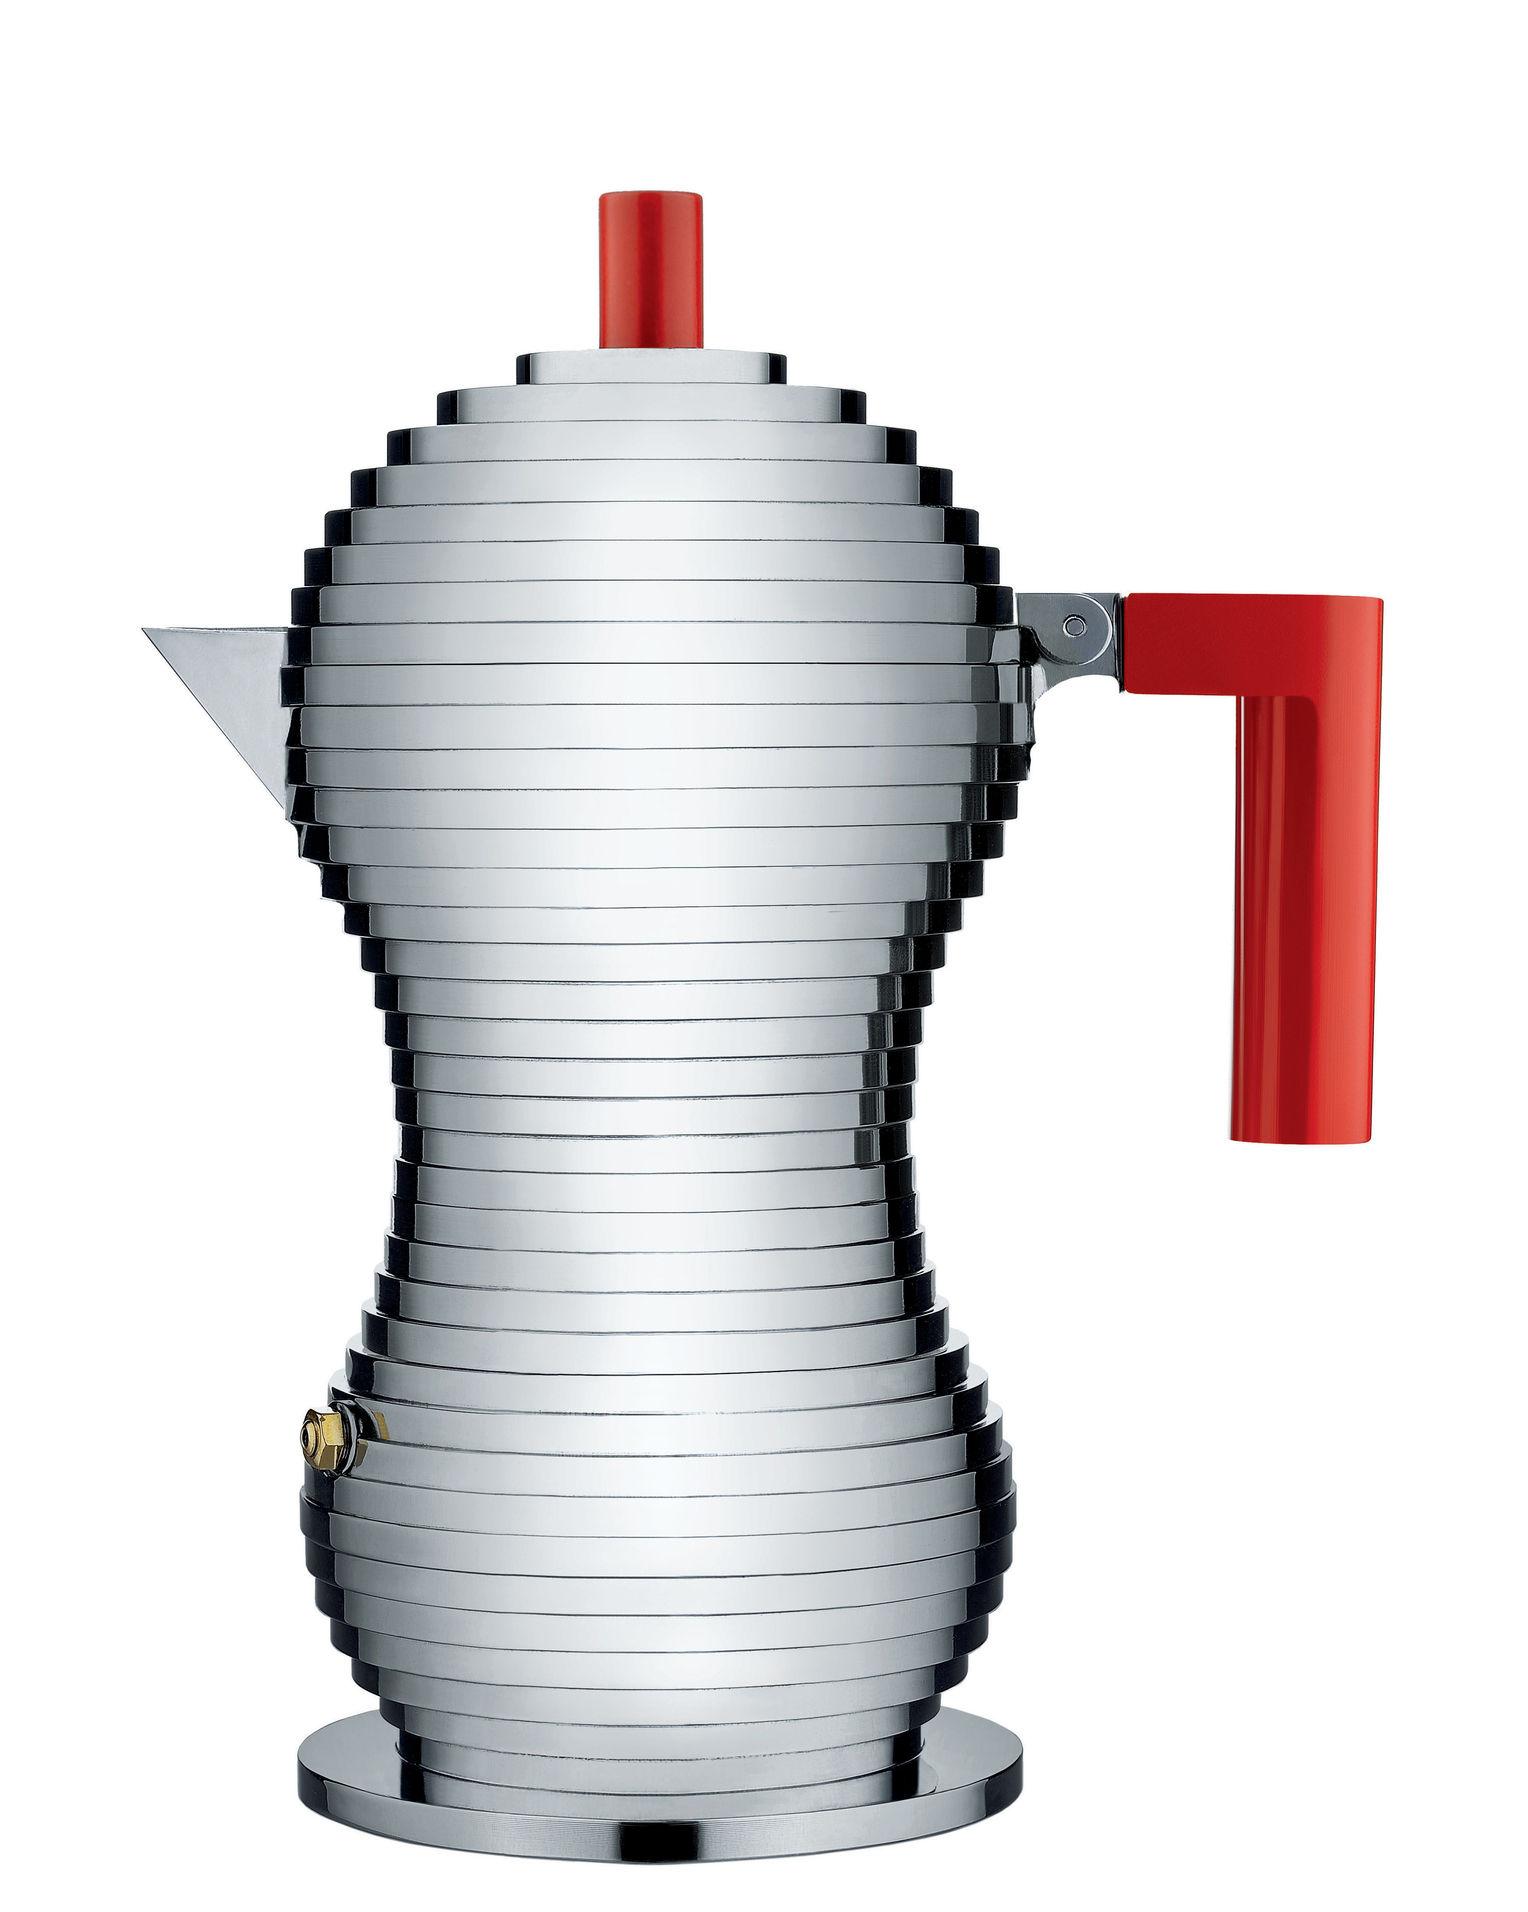 Cucina - Macchina da caffè - Caffettiera italiana Pulcina / 3 tazze - Alessi - Rosso - Ghisa di alluminio, Plastica